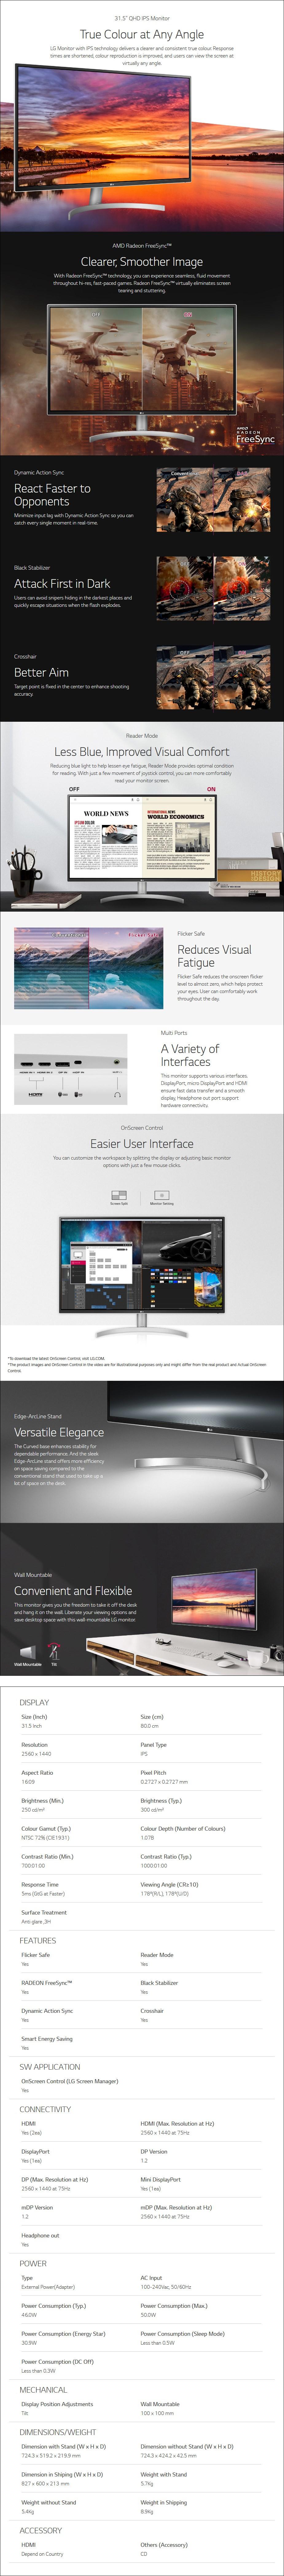 "LG 32QK500-C 31.5"" 75Hz QHD FreeSync IPS Monitor - Overview 1"